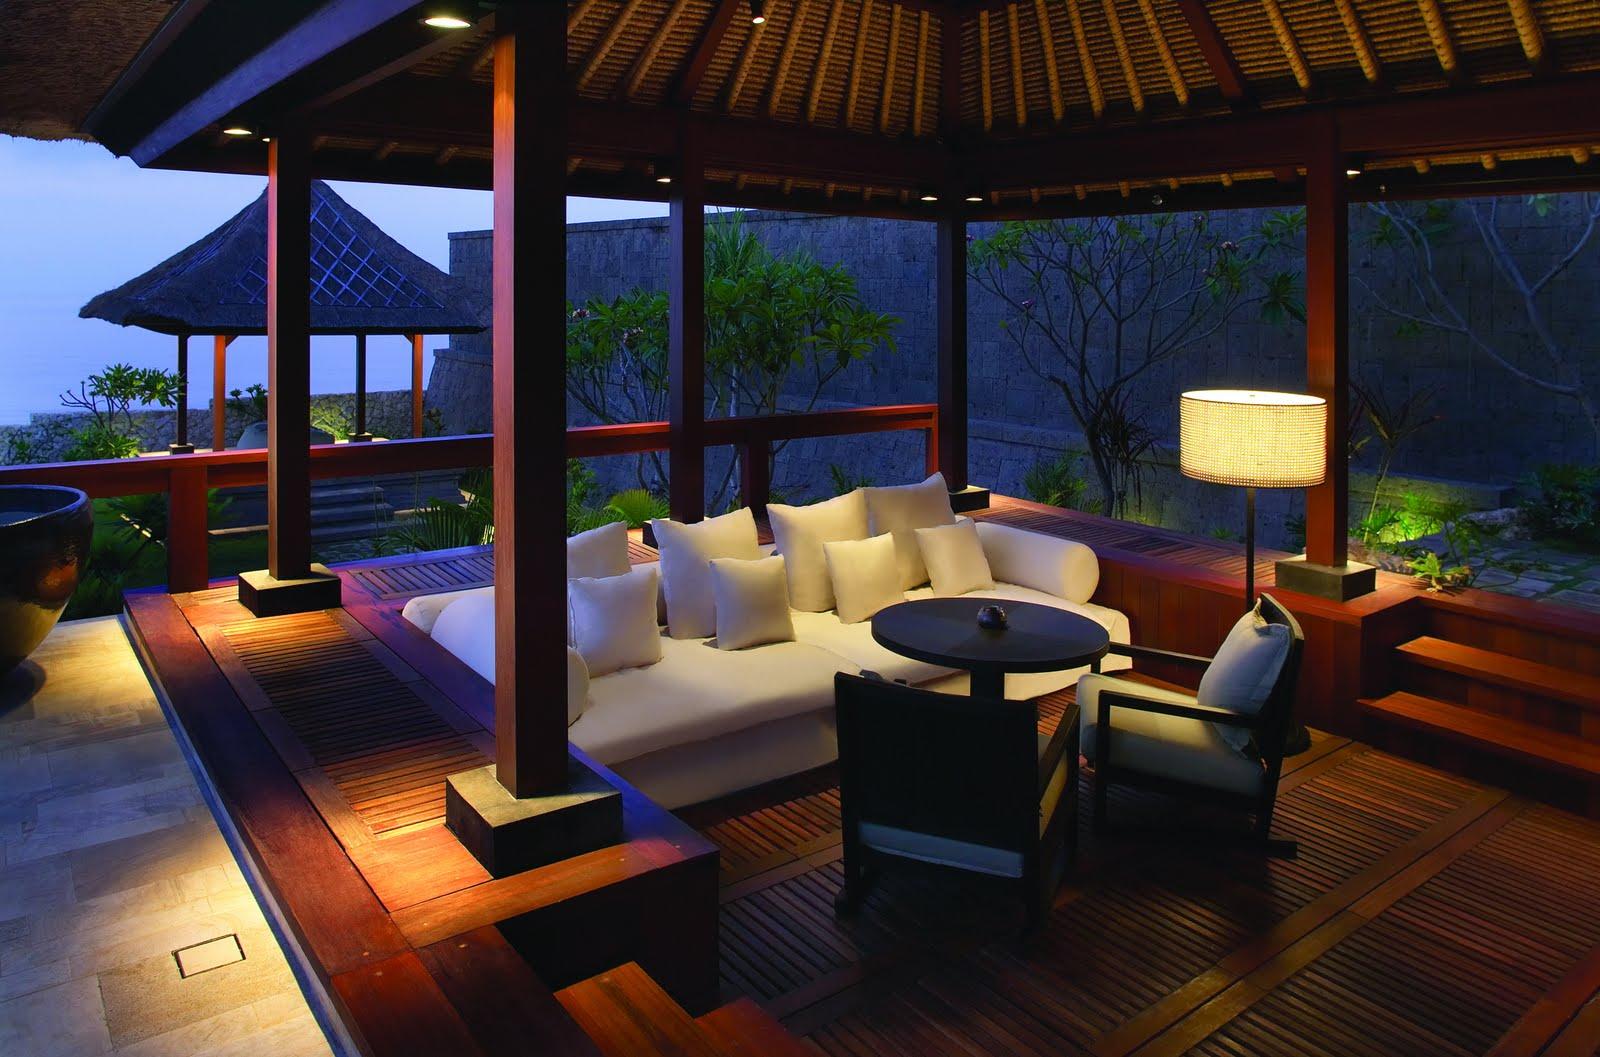 The Bulgari Villa Hotel Outdoor Living Room MyHouseIdea